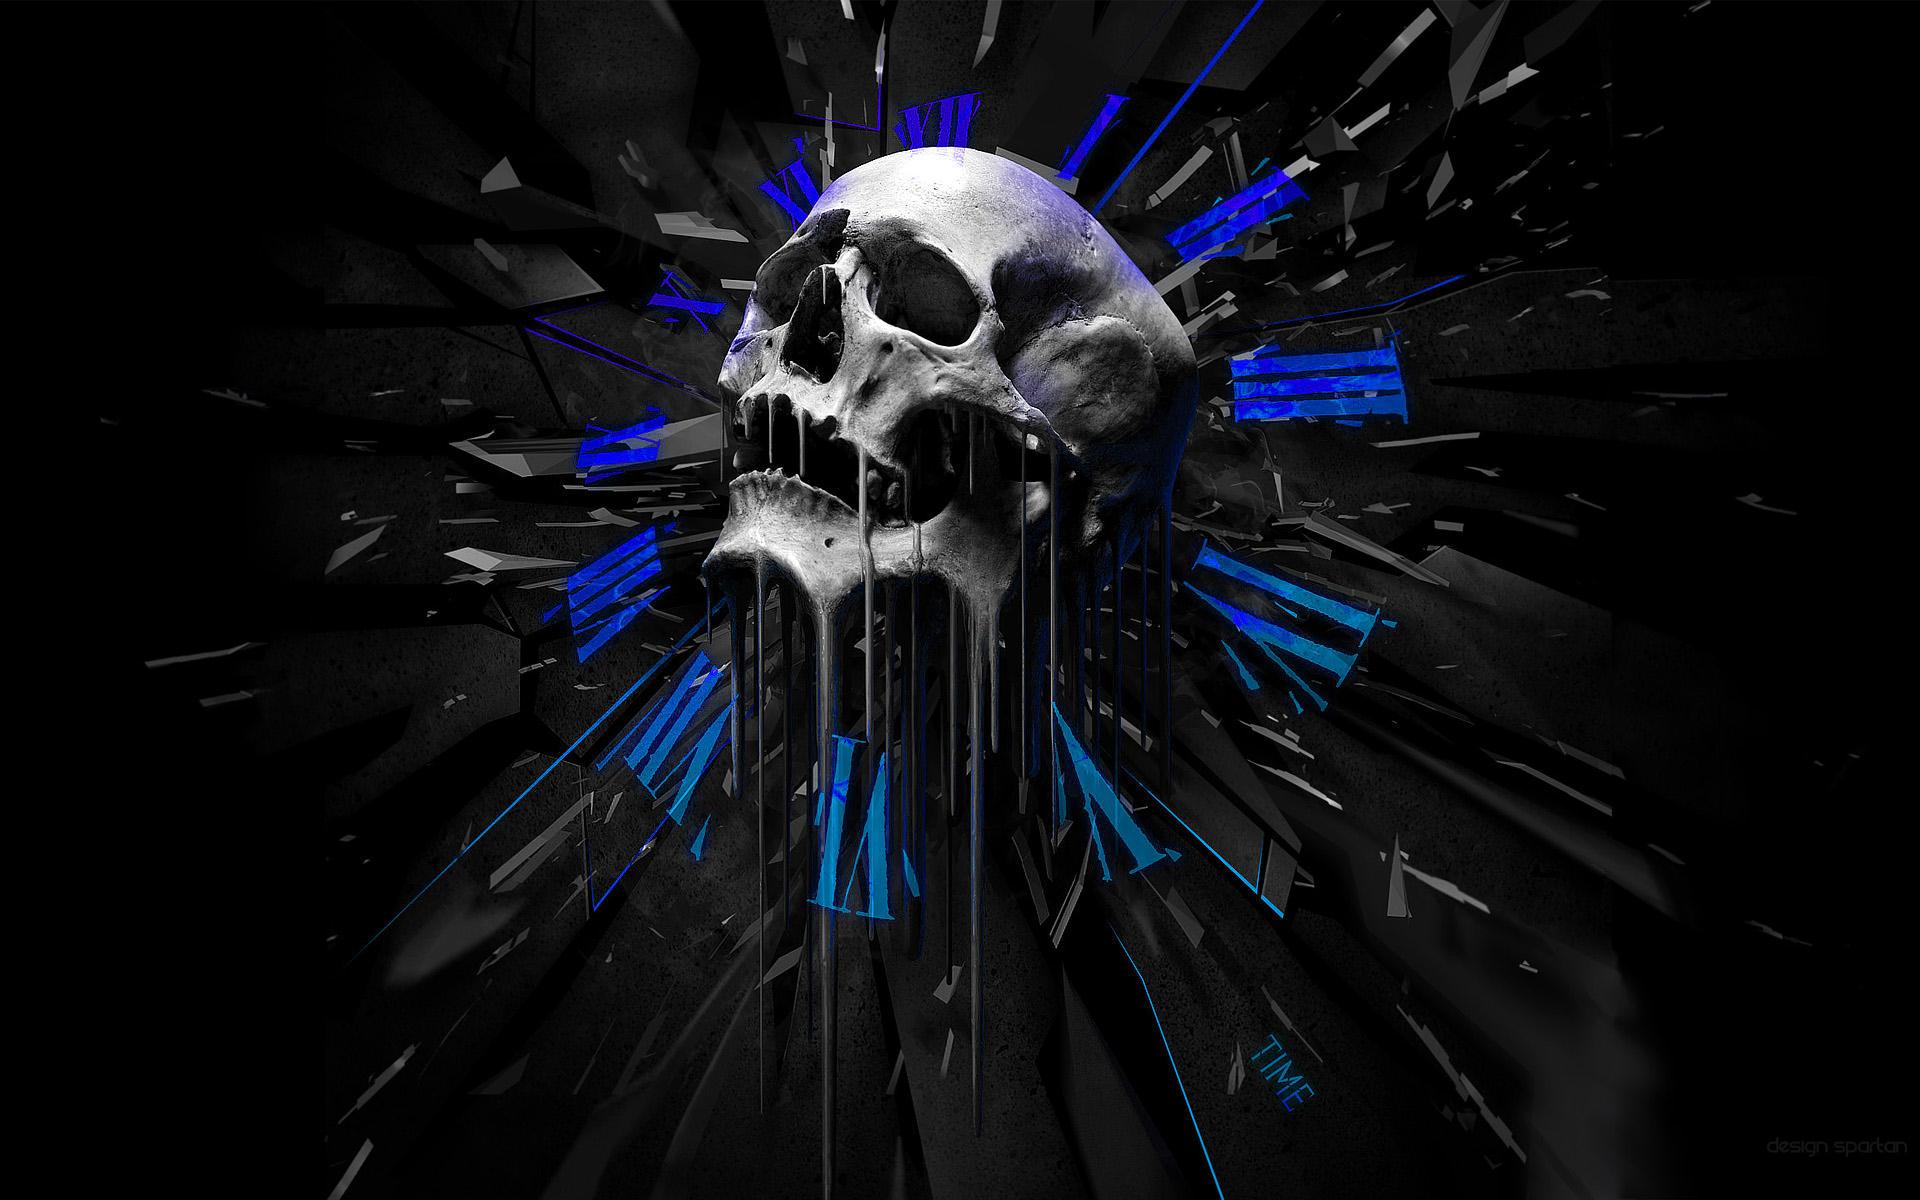 Skull Wallpapers  Full HD wallpaper search